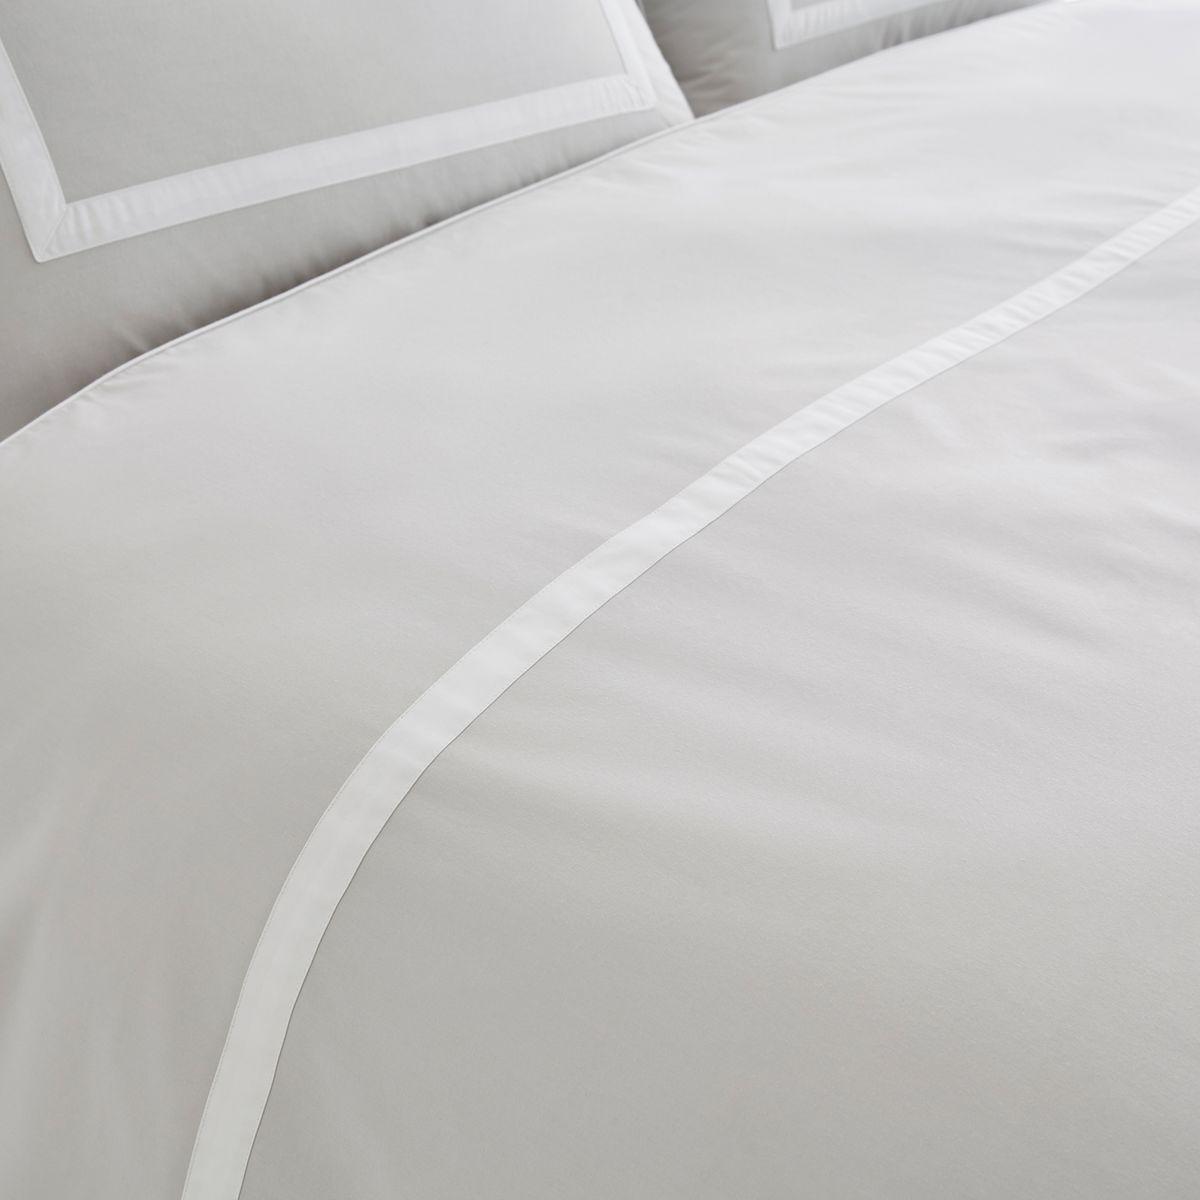 Othoza Monochrome Organic Cotton Percale Duvet Cover